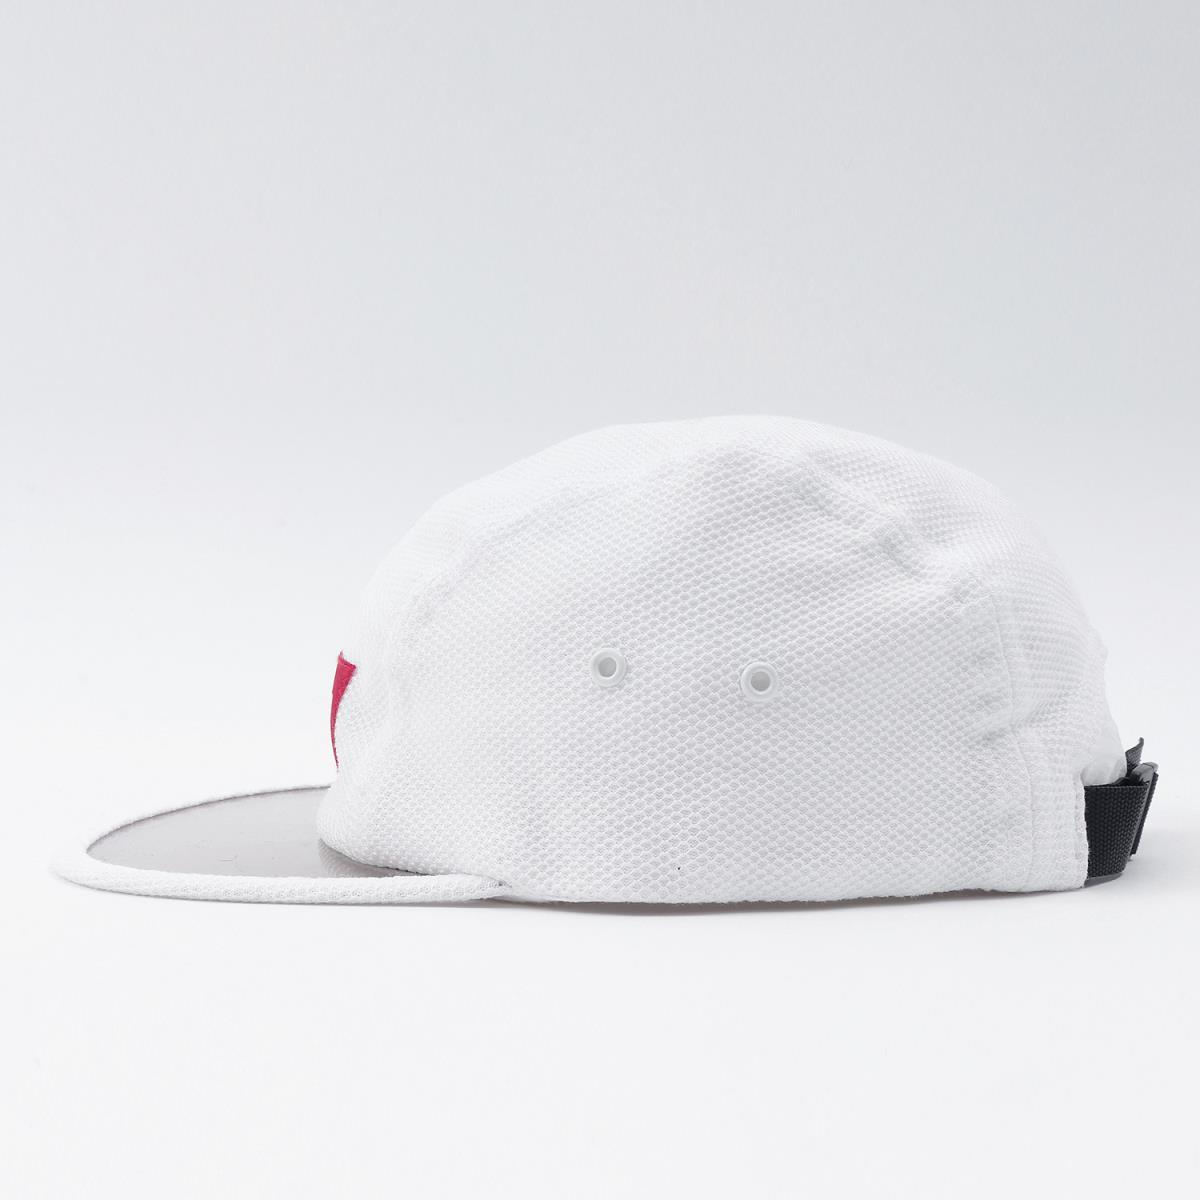 4d67eb05681 Supreme (シュプリーム) 17S S clear visor BOX logo picket camping cap (Pique  Angler Camp Cap) white